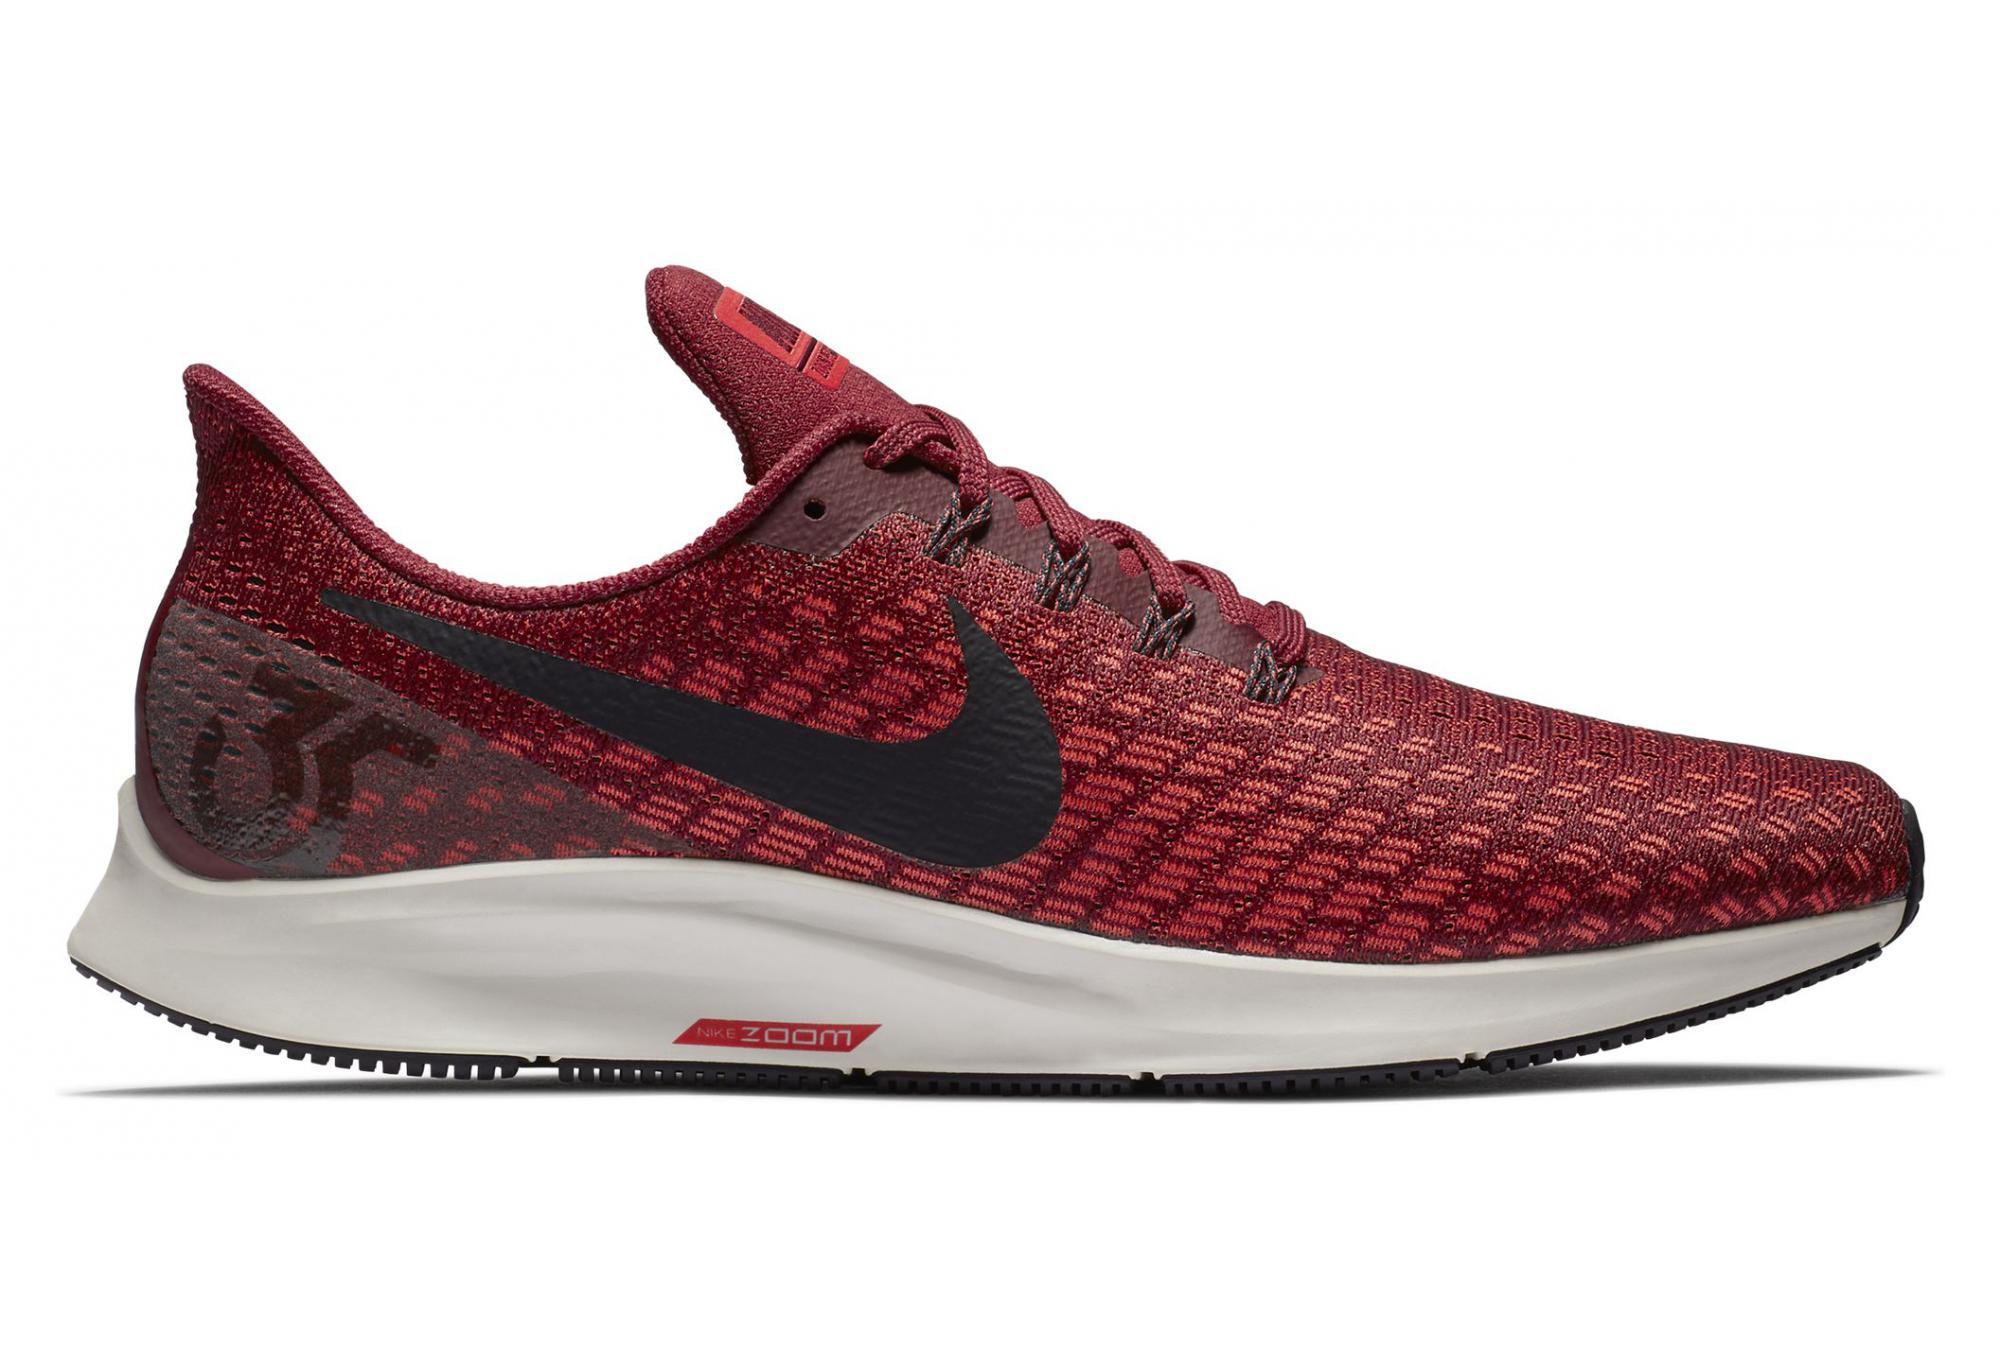 Scarpe da Running Nike Shoes Air Zoom Pegasus 35 Rosso da Uomo